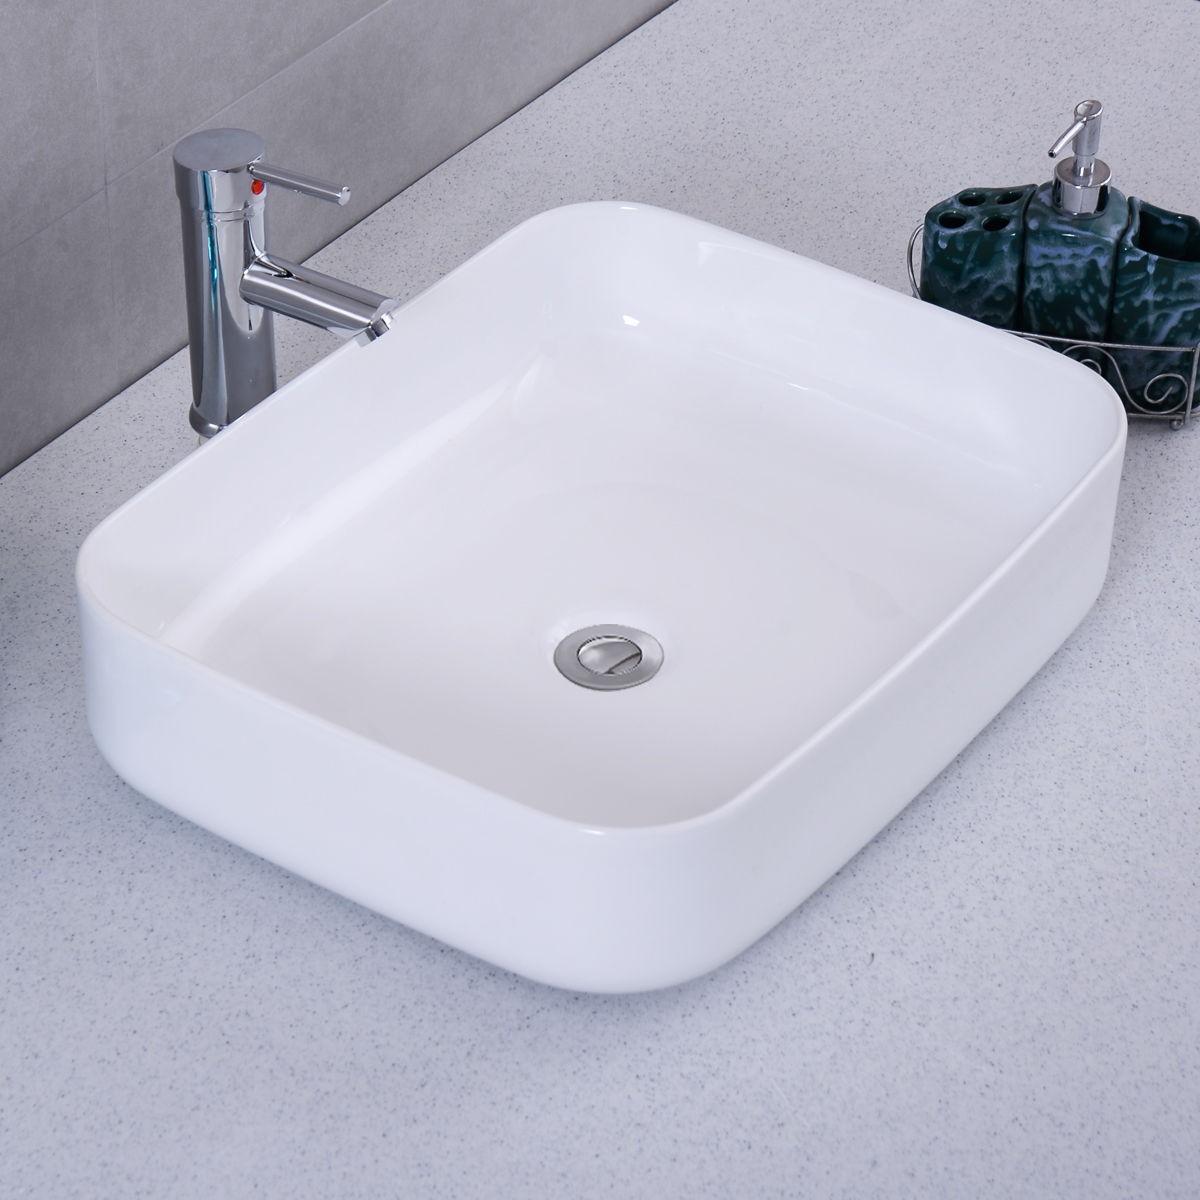 Modern Ceramic Rectangle White Vessel Sink Bathroom Vanity Art Basin Bowl US